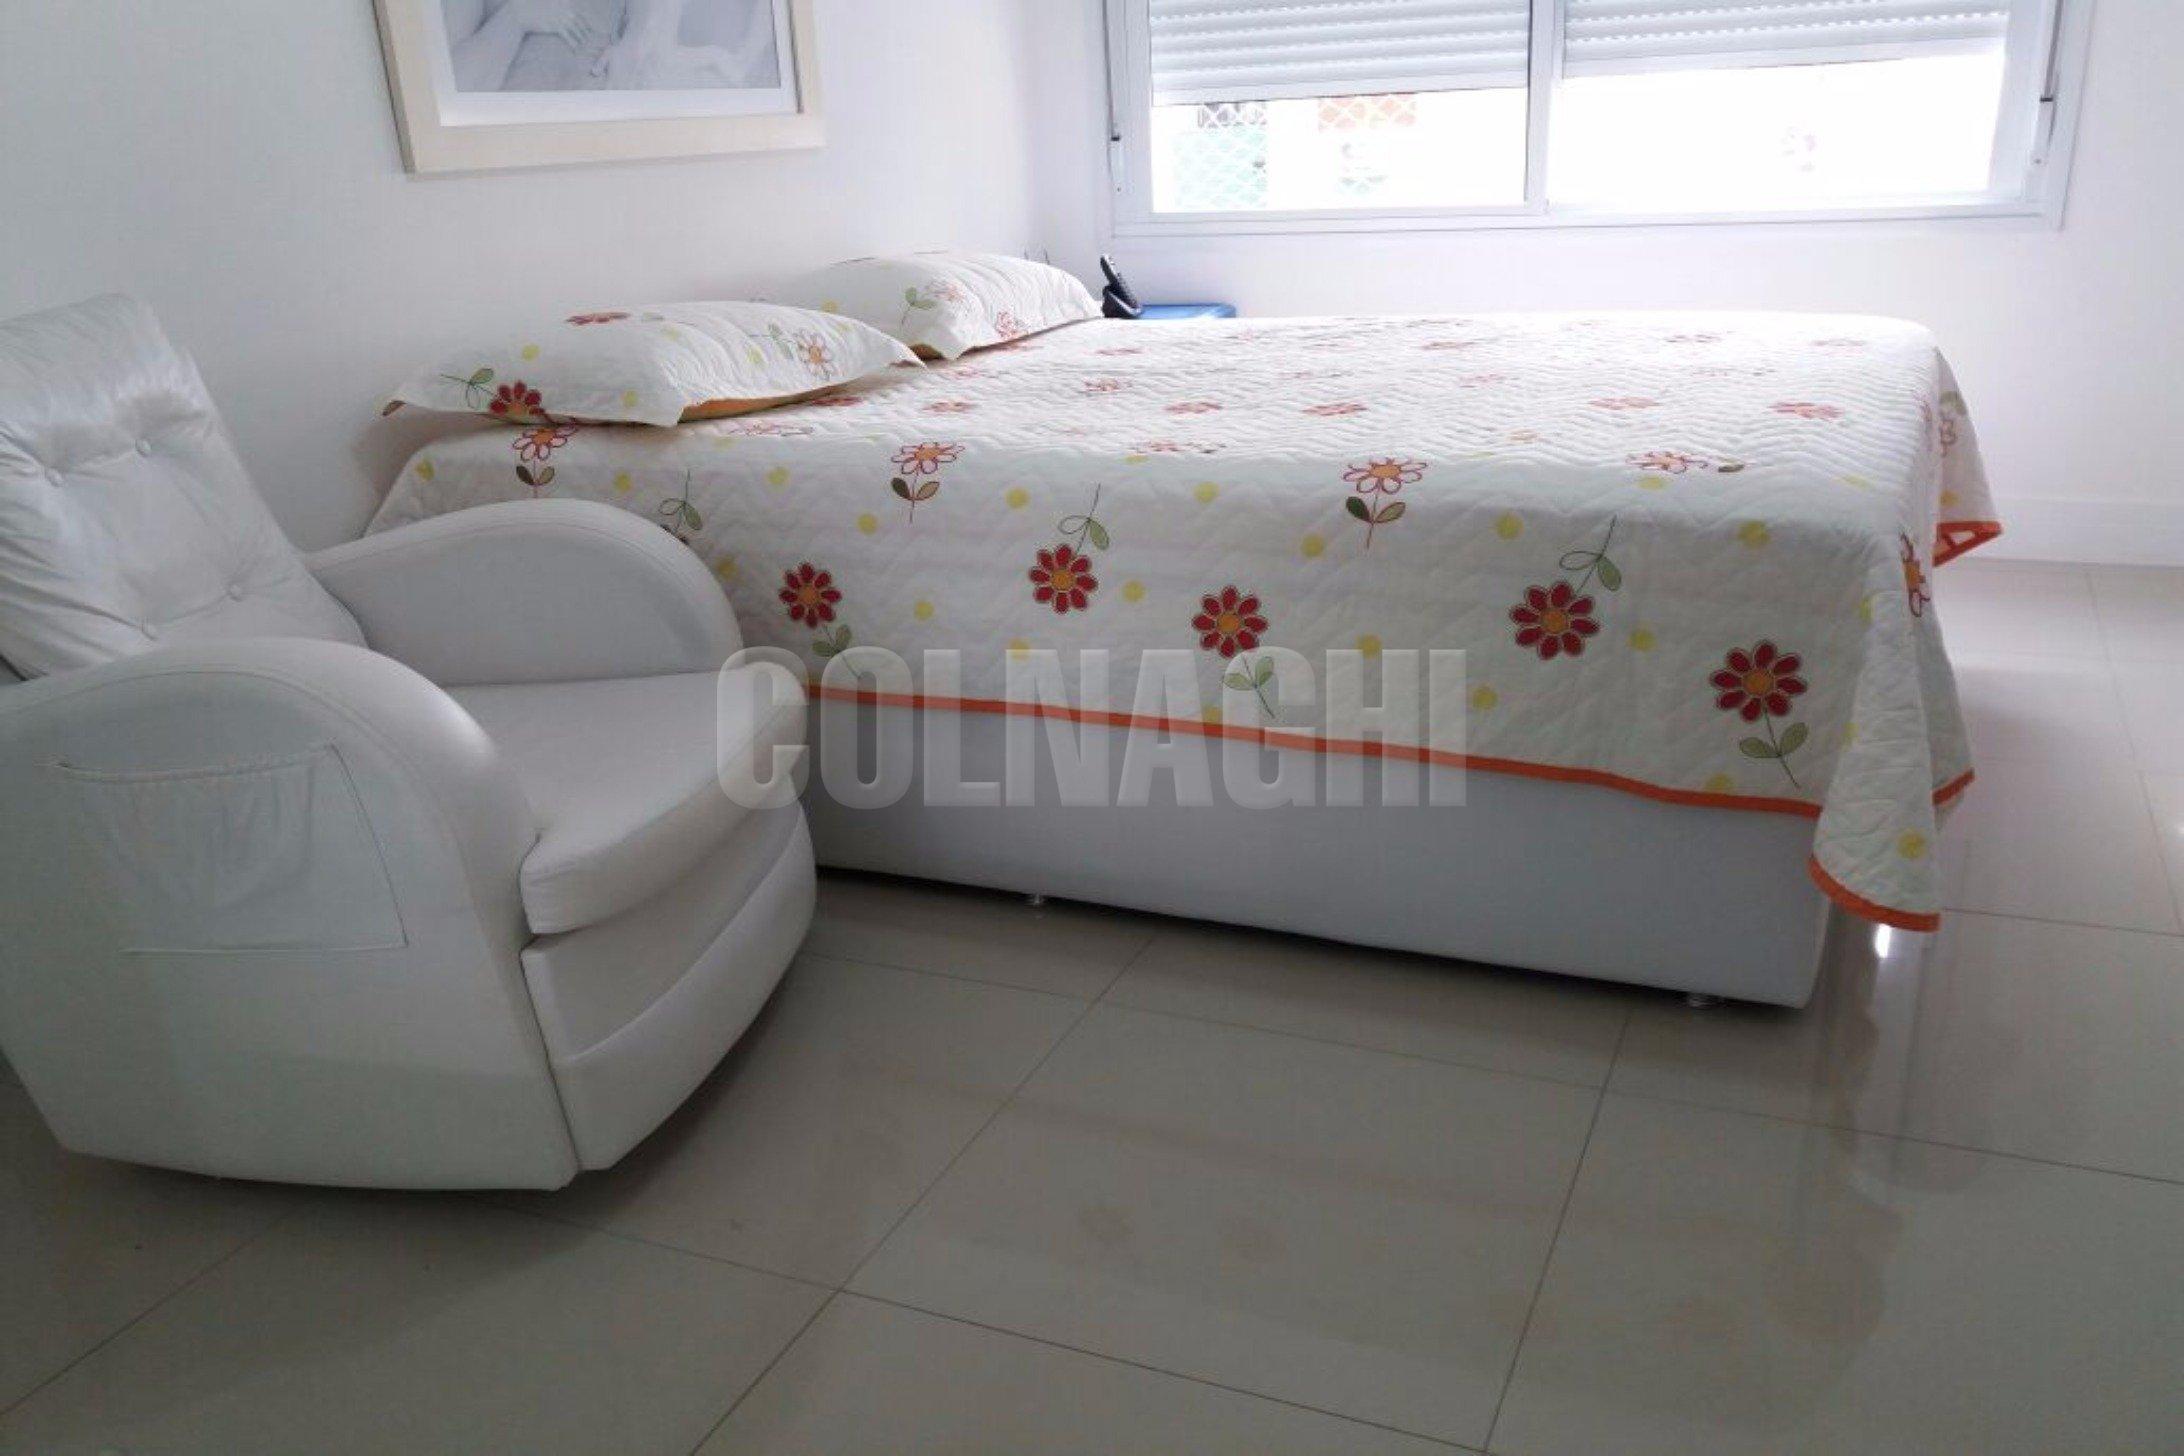 Jandir Maya Faillace - Apto 3 Dorm, Centro Historico, Porto Alegre - Foto 9